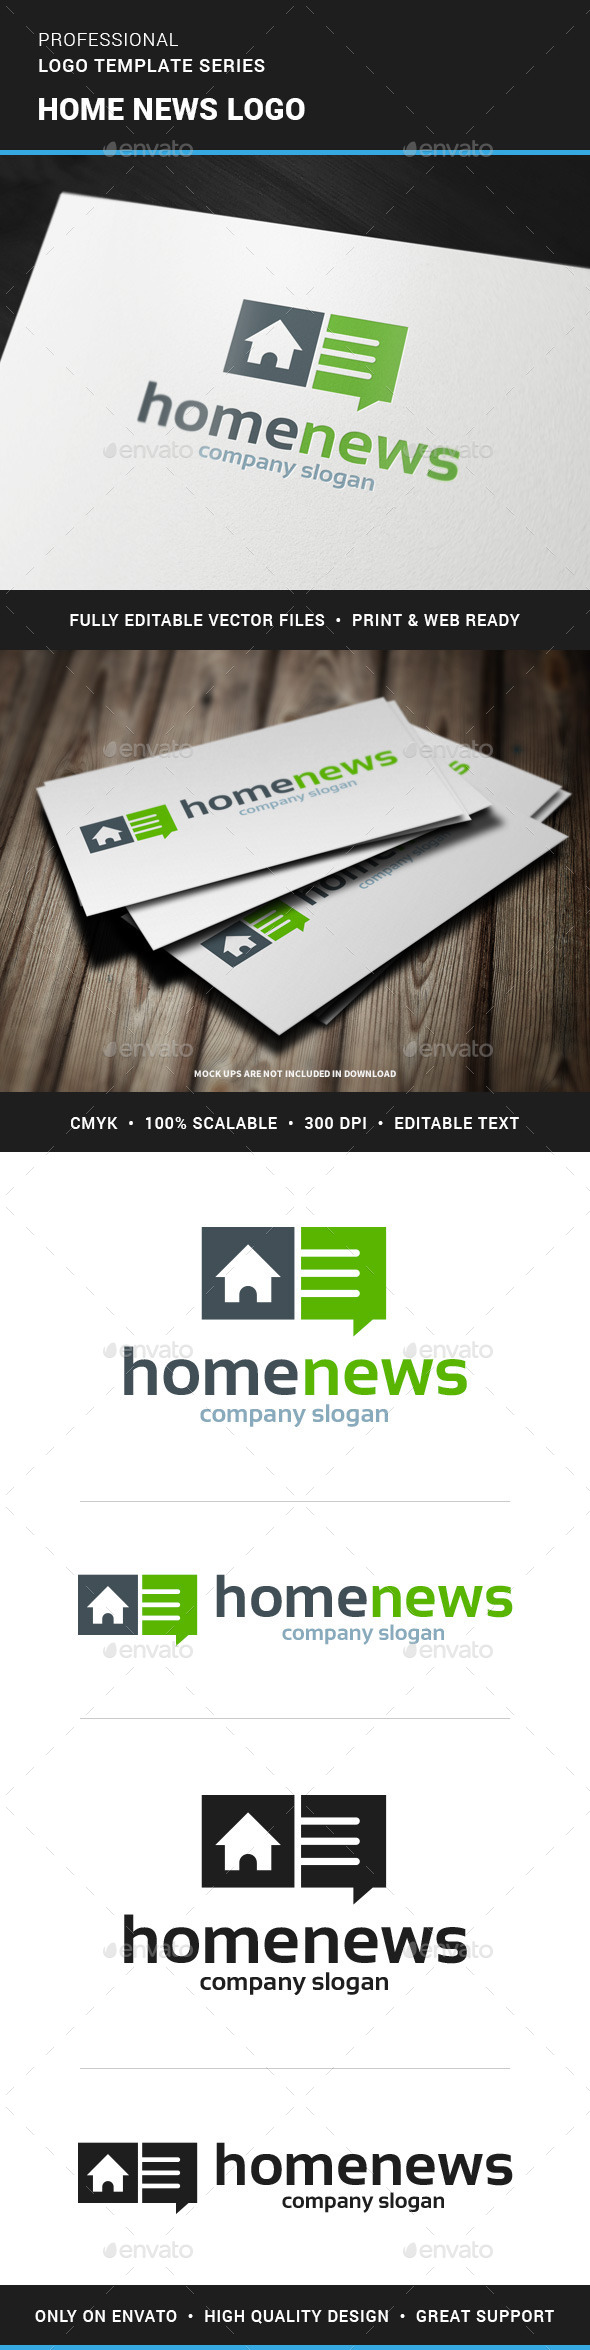 Home News Logo Template - Buildings Logo Templates